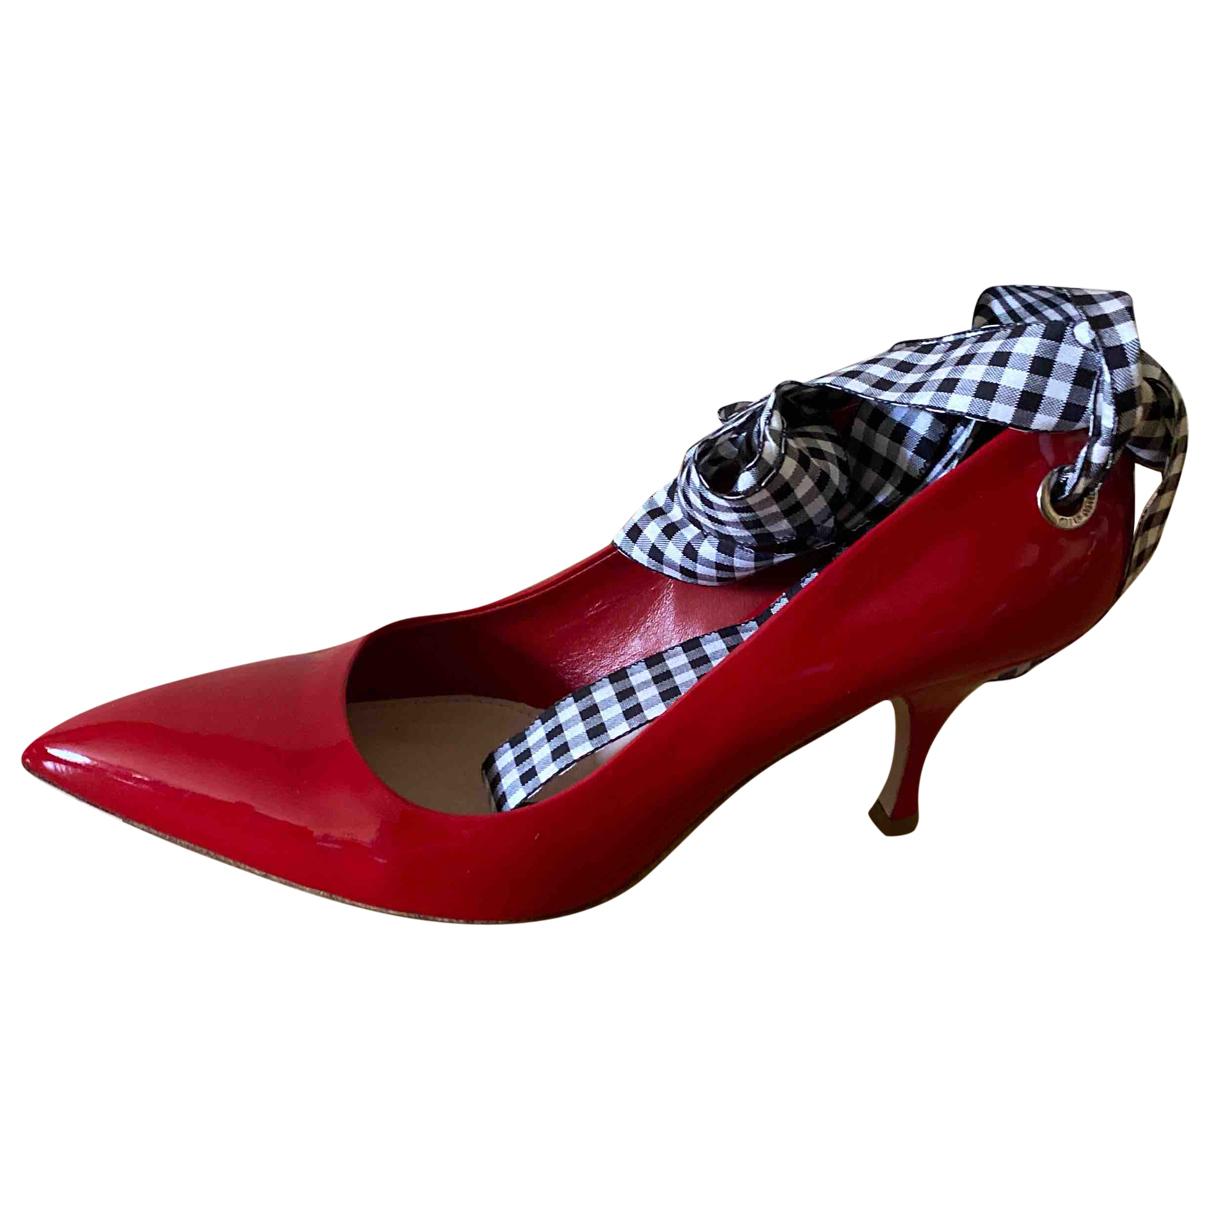 Miu Miu \N Red Patent leather Heels for Women 39.5 EU